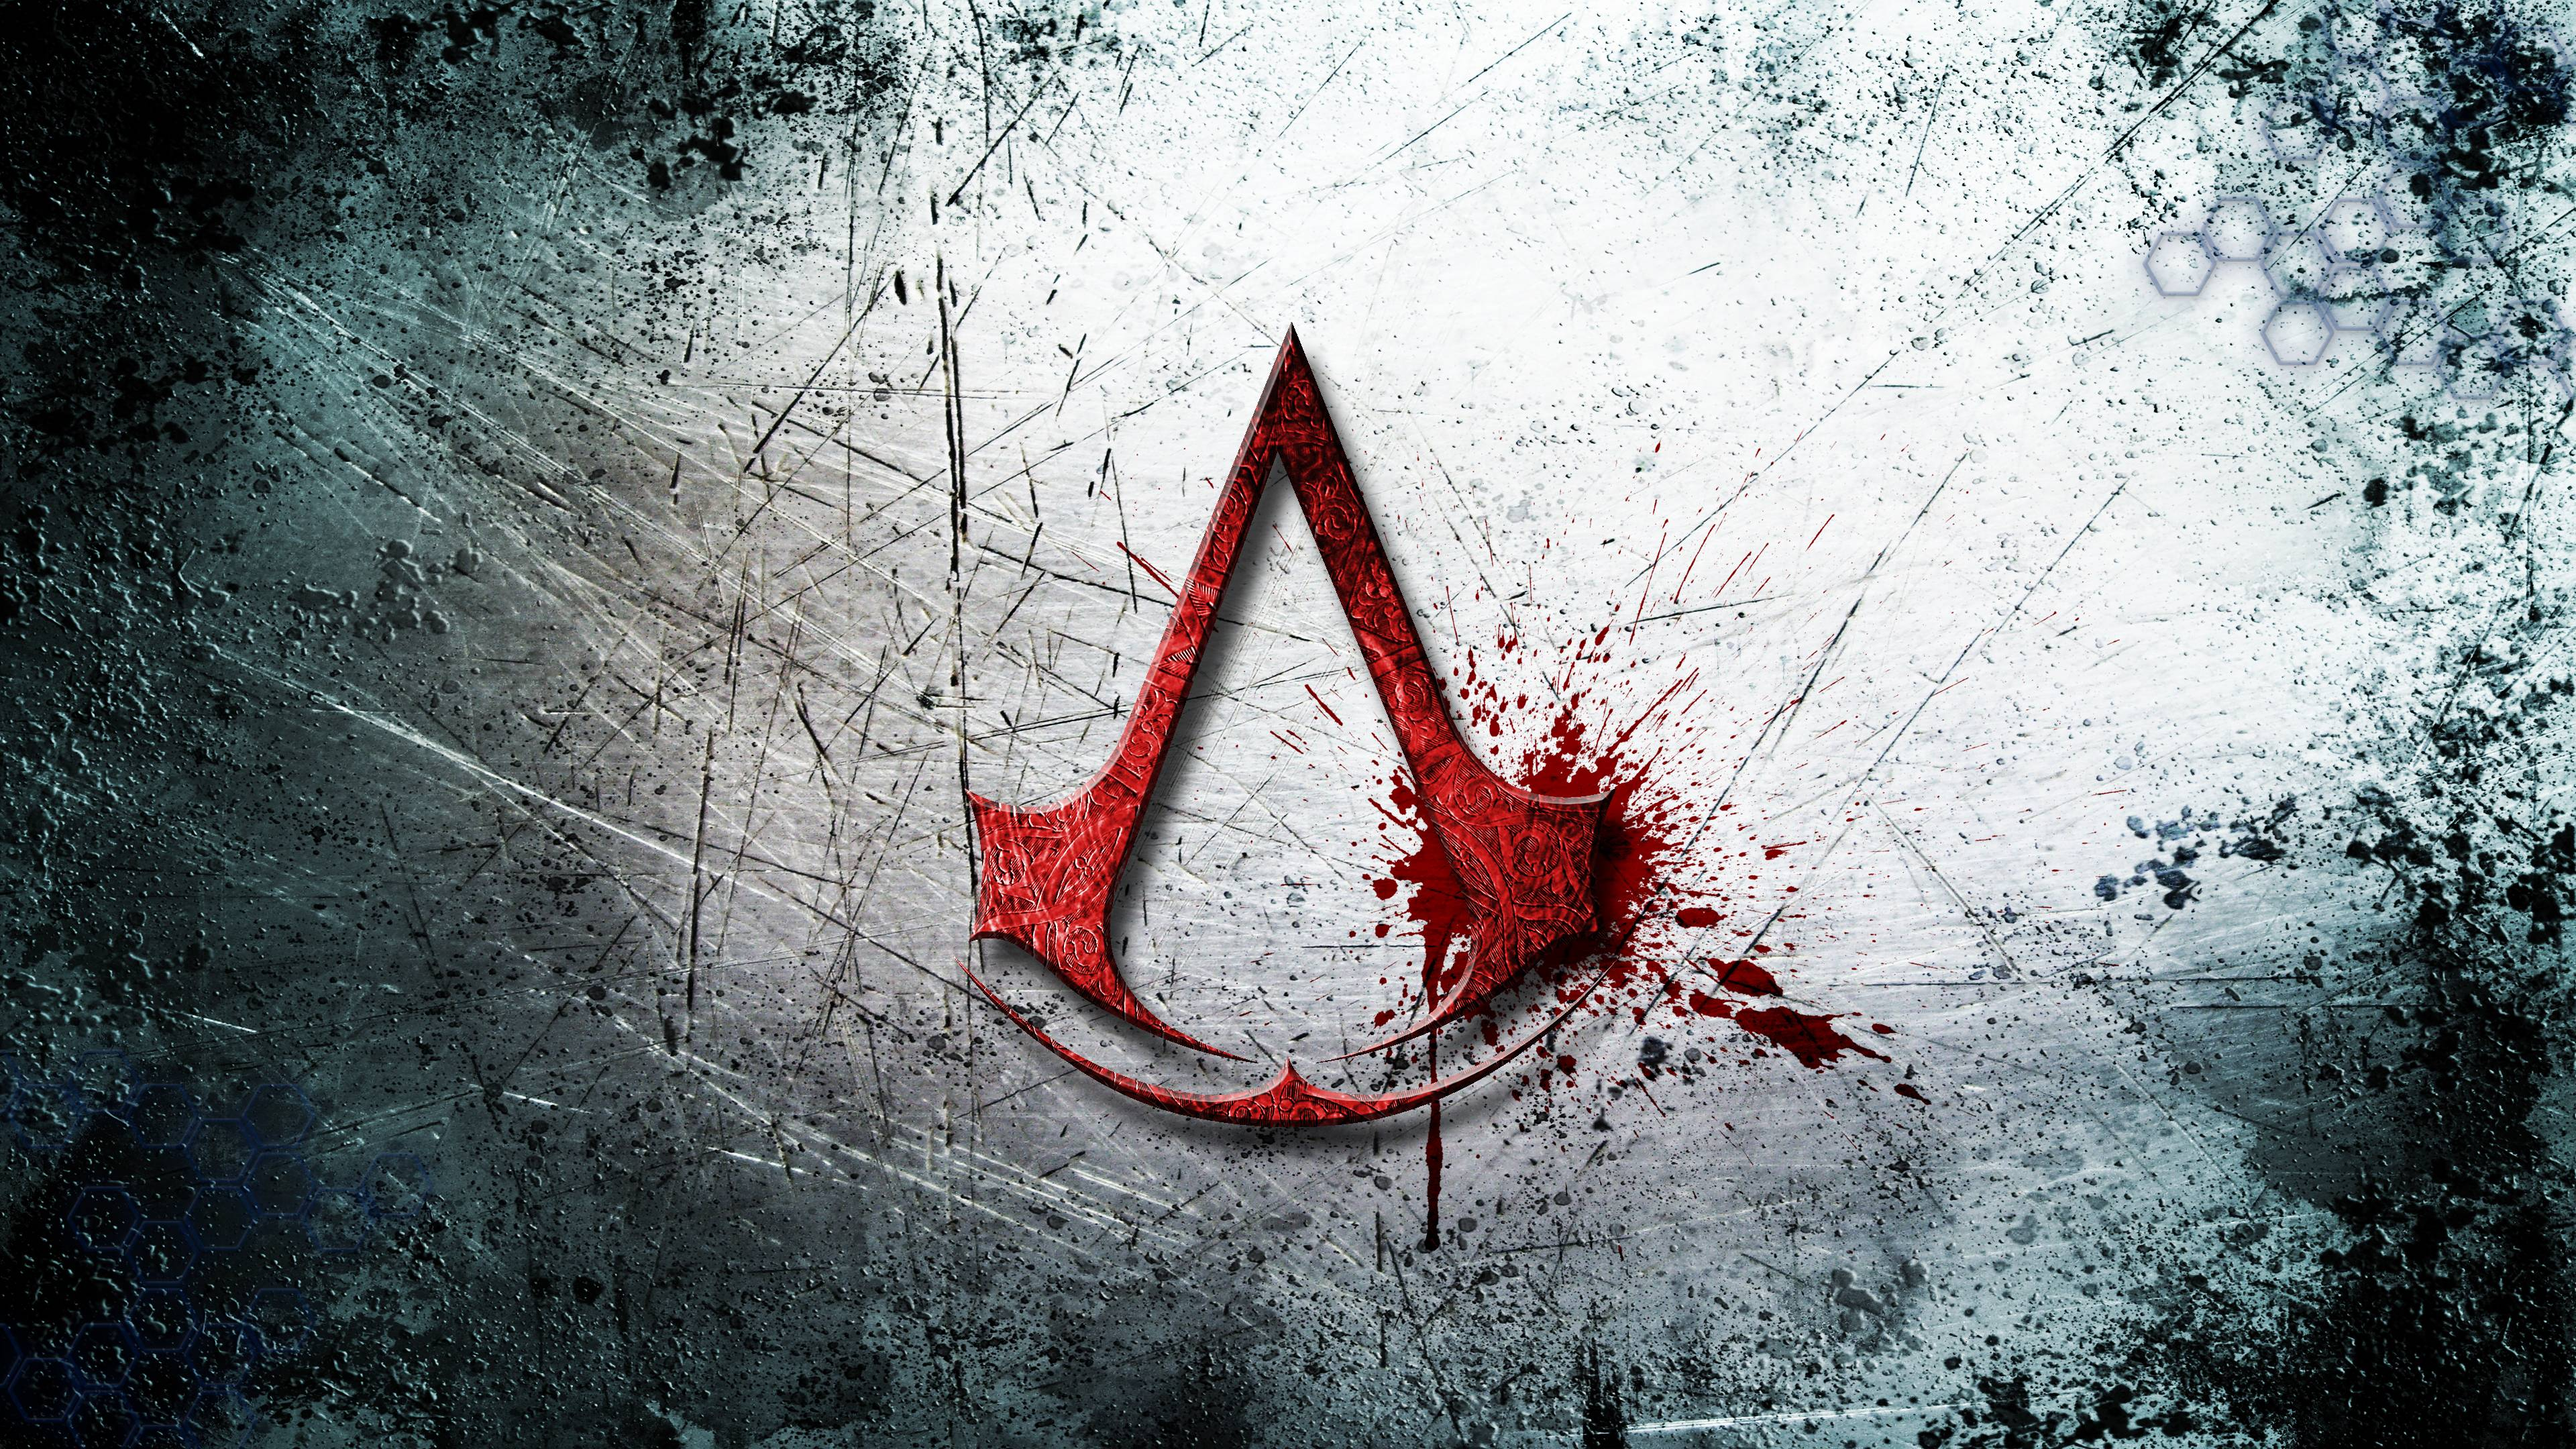 Assassins Creed Wallpaper HD Images 72512vxc Yoanu 3840x2160